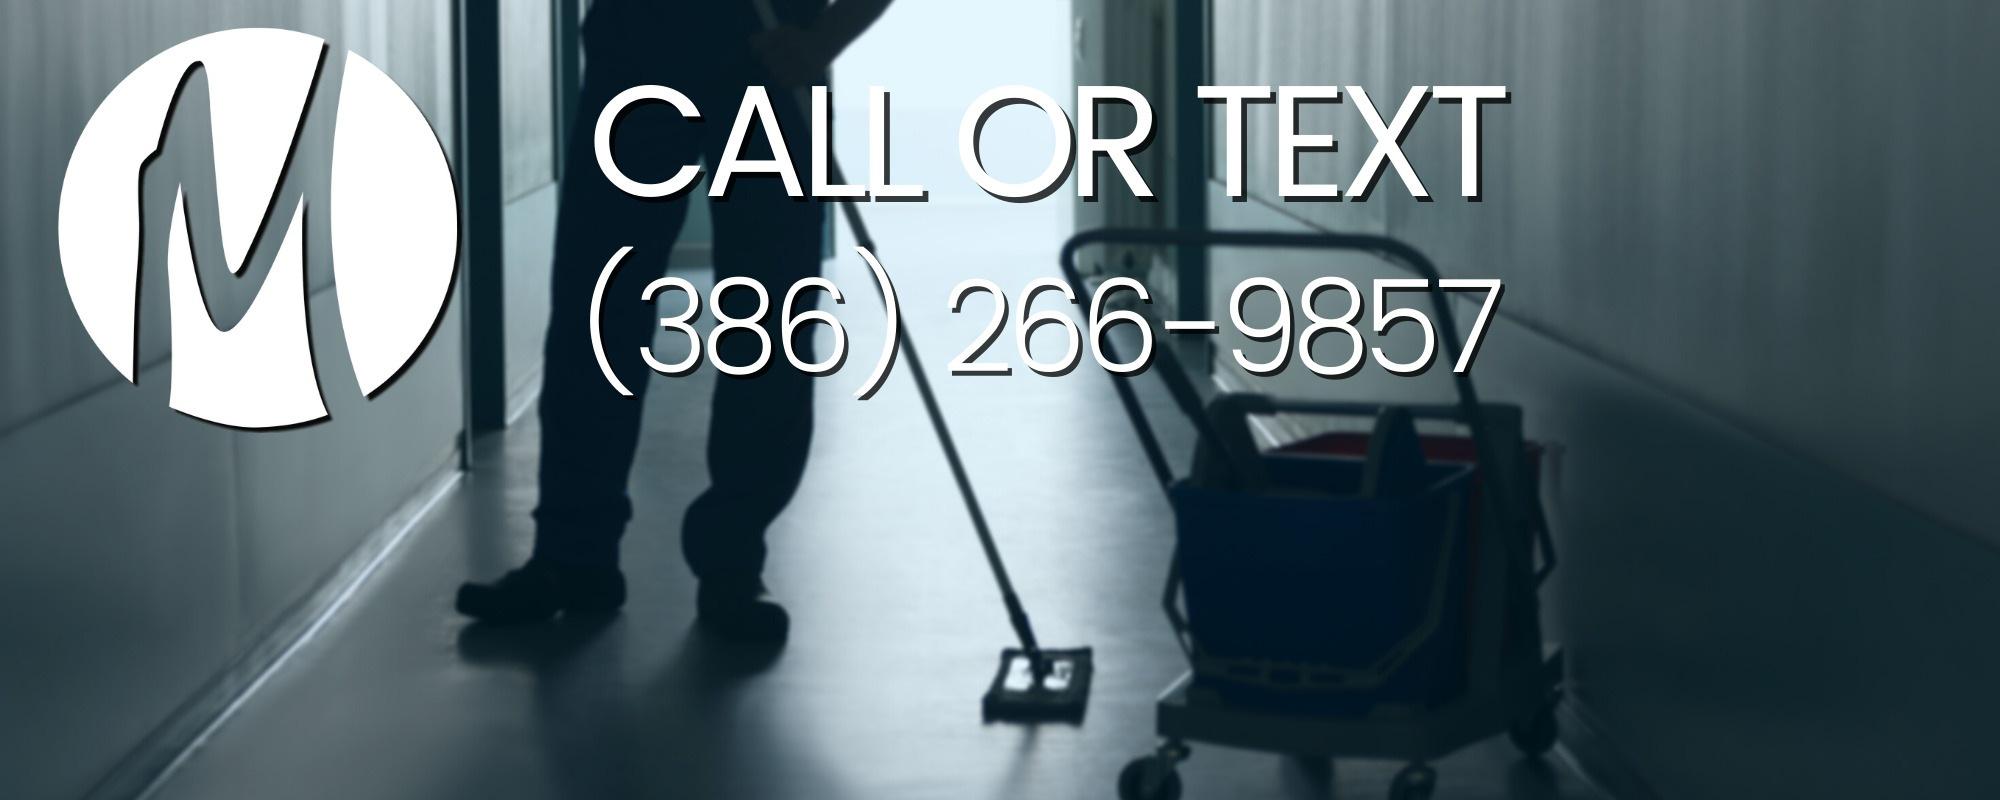 floor cleaning Daytona Beach company wax strip commercial